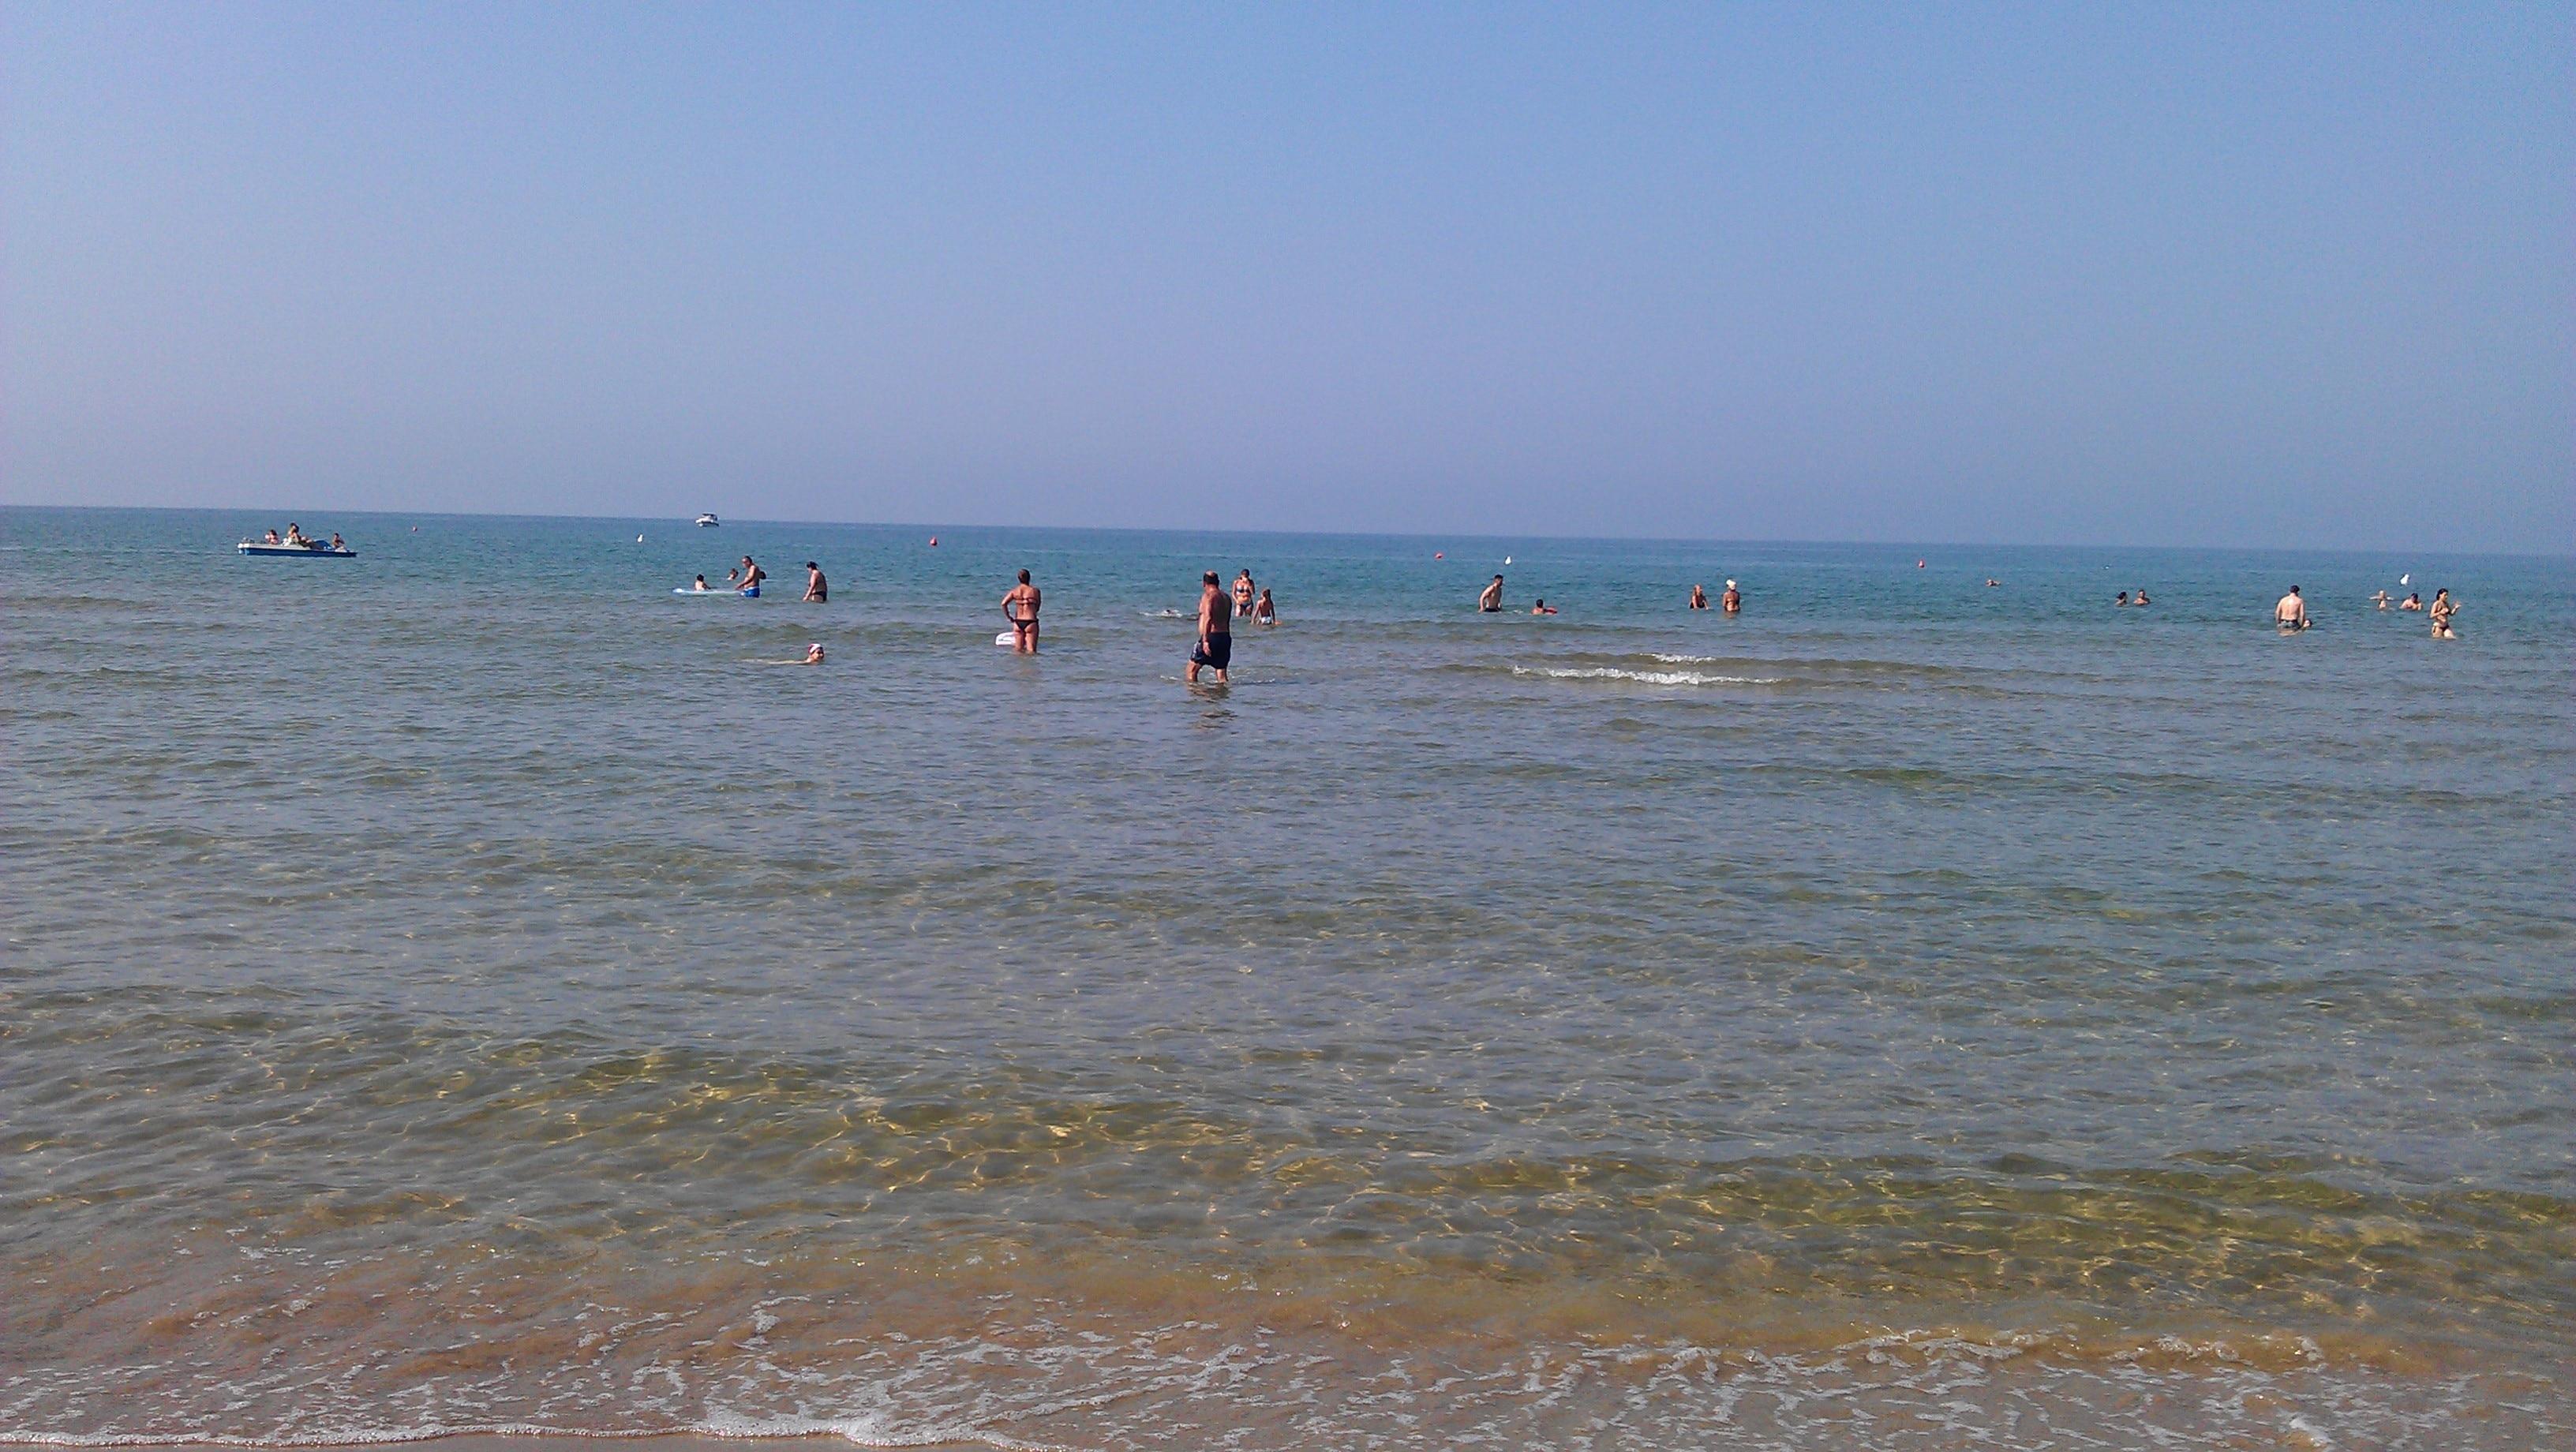 Ariana Beach, Gaeta, Lazio, Italy